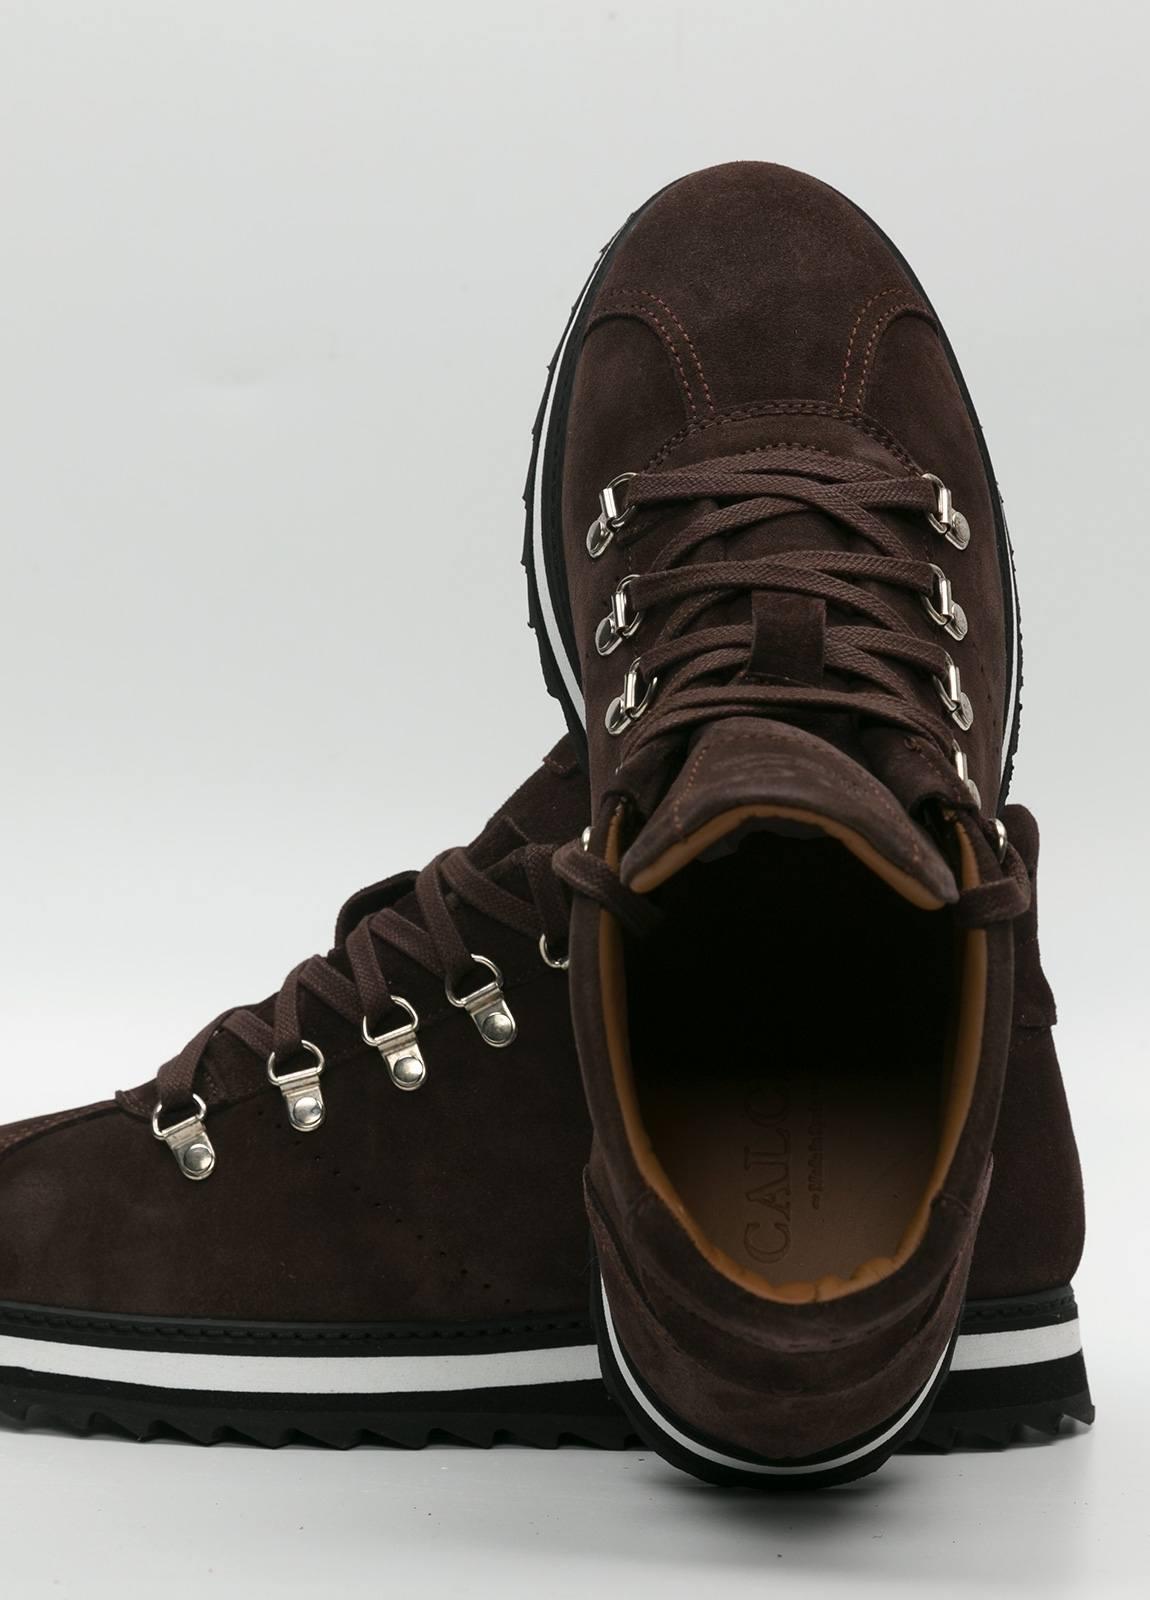 Bota sport de cordones, color marrón oscuro. 100% Piel Ante. - Ítem4